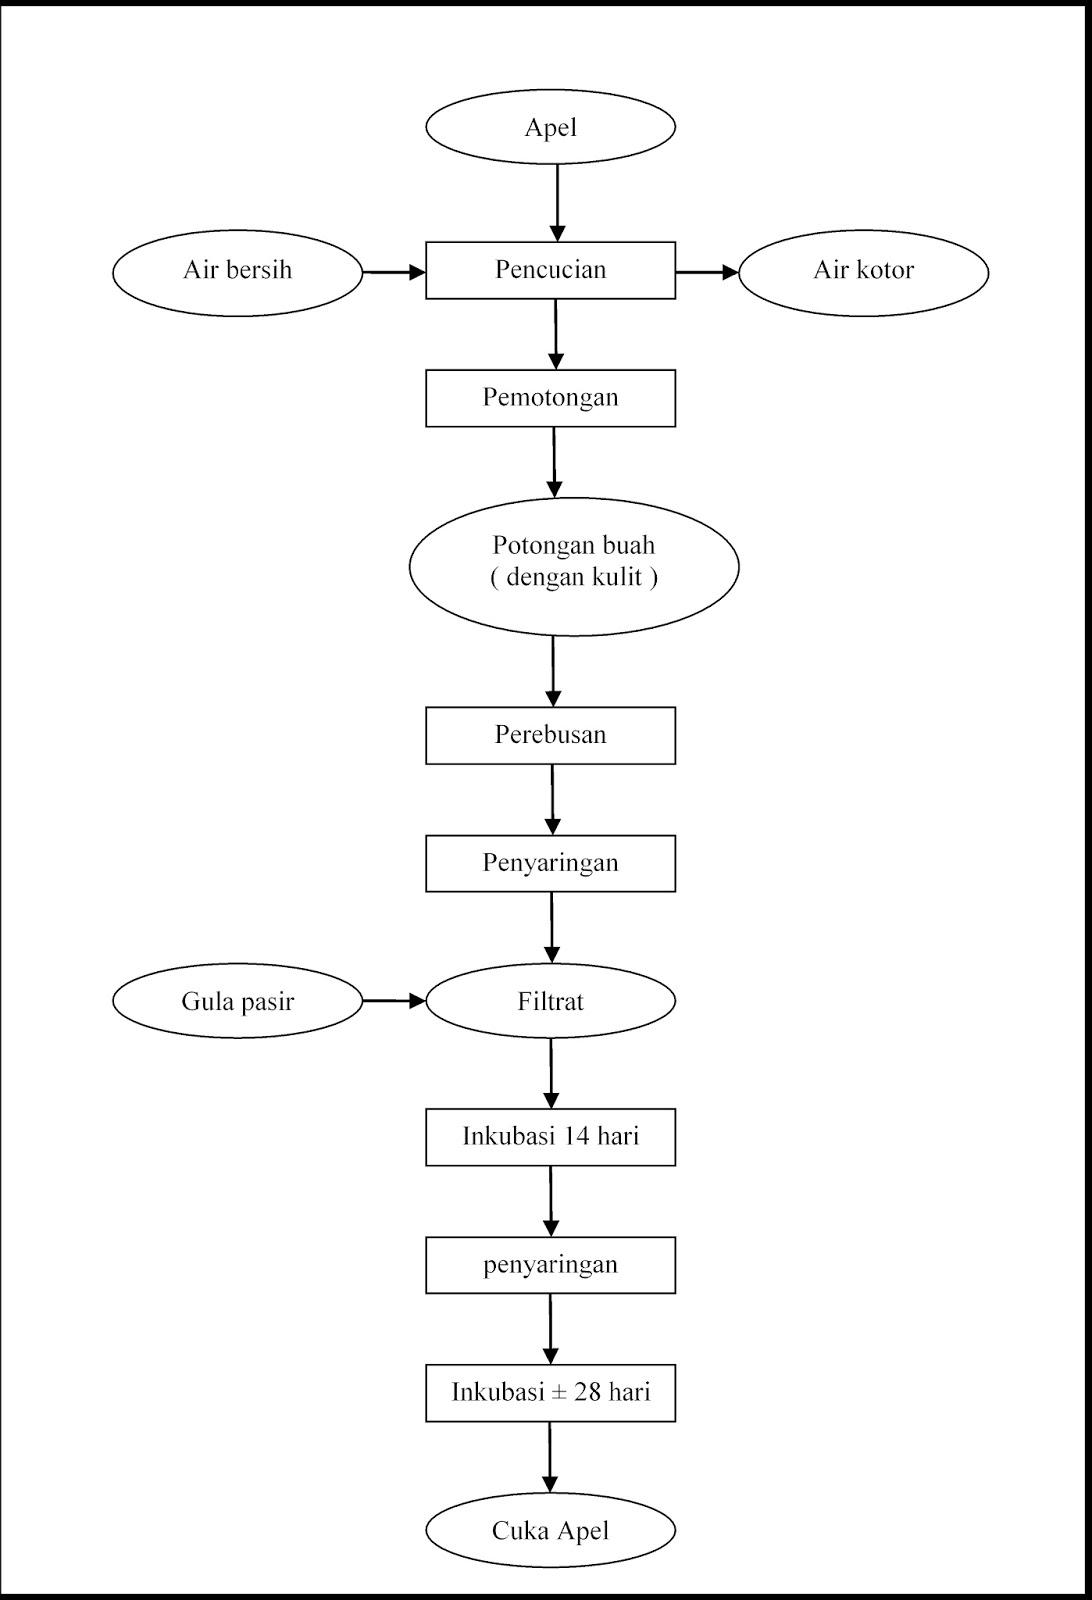 Laporan praktikum cuka apel my corner diagram alir ccuart Choice Image